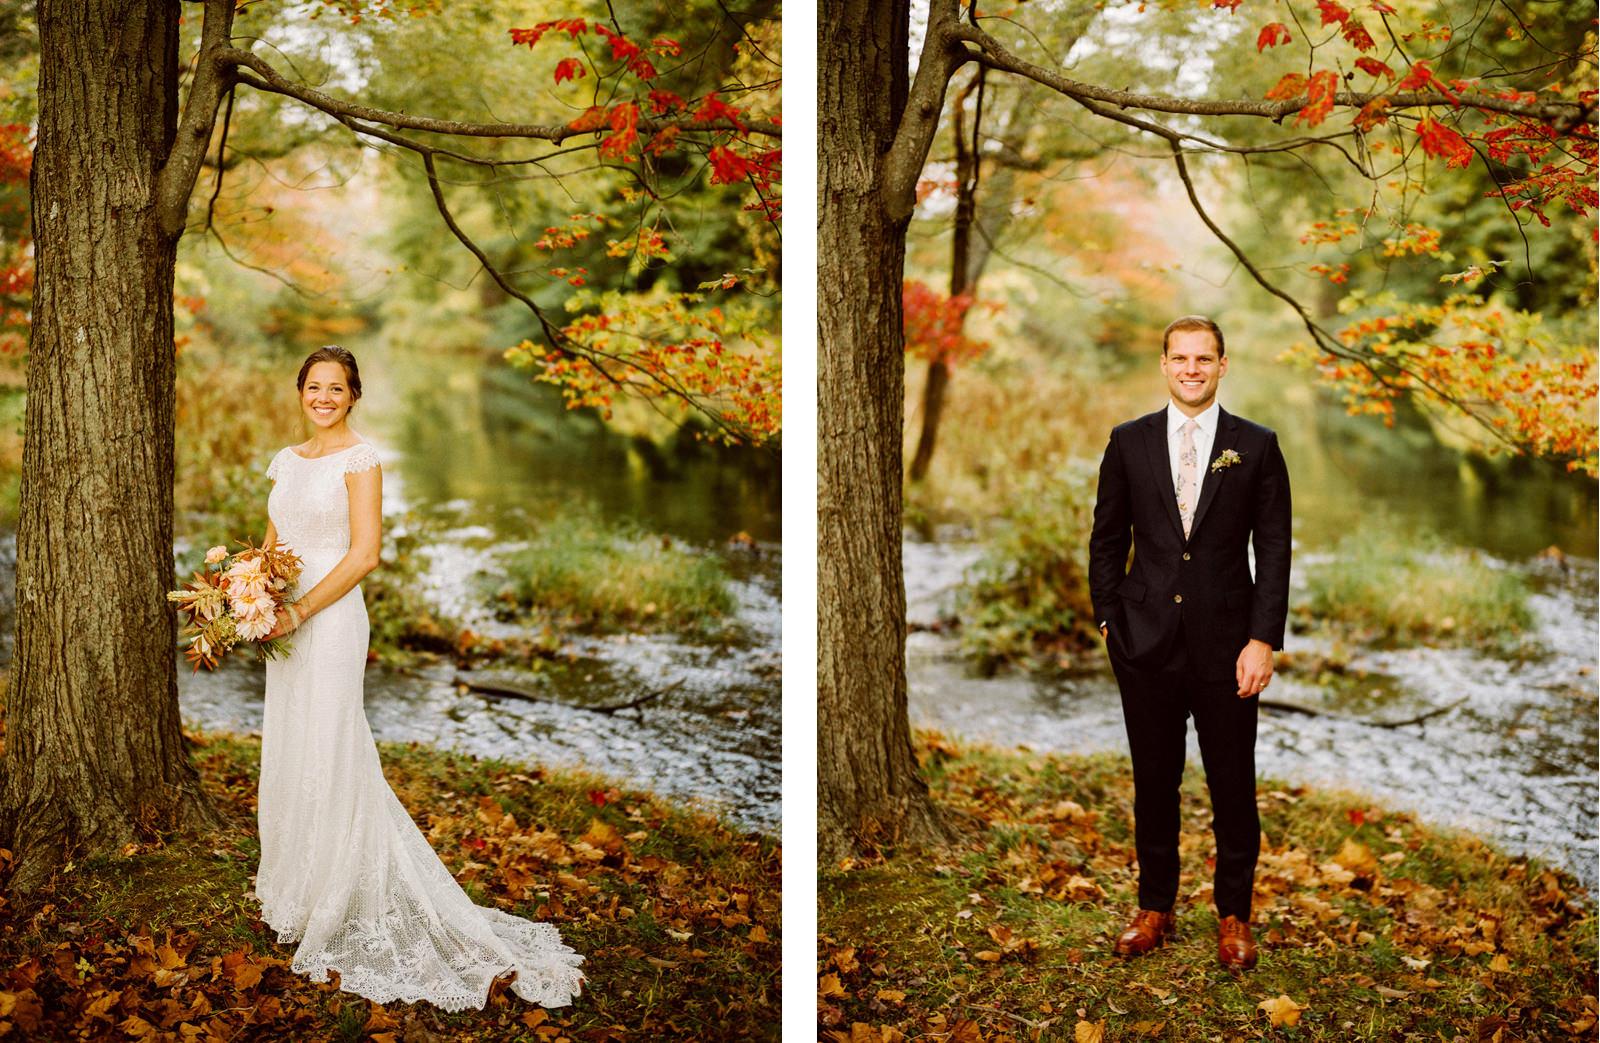 bridgeport-wedding-106 BRIDGEPORT, CONNECTICUT BACKYARD WEDDING